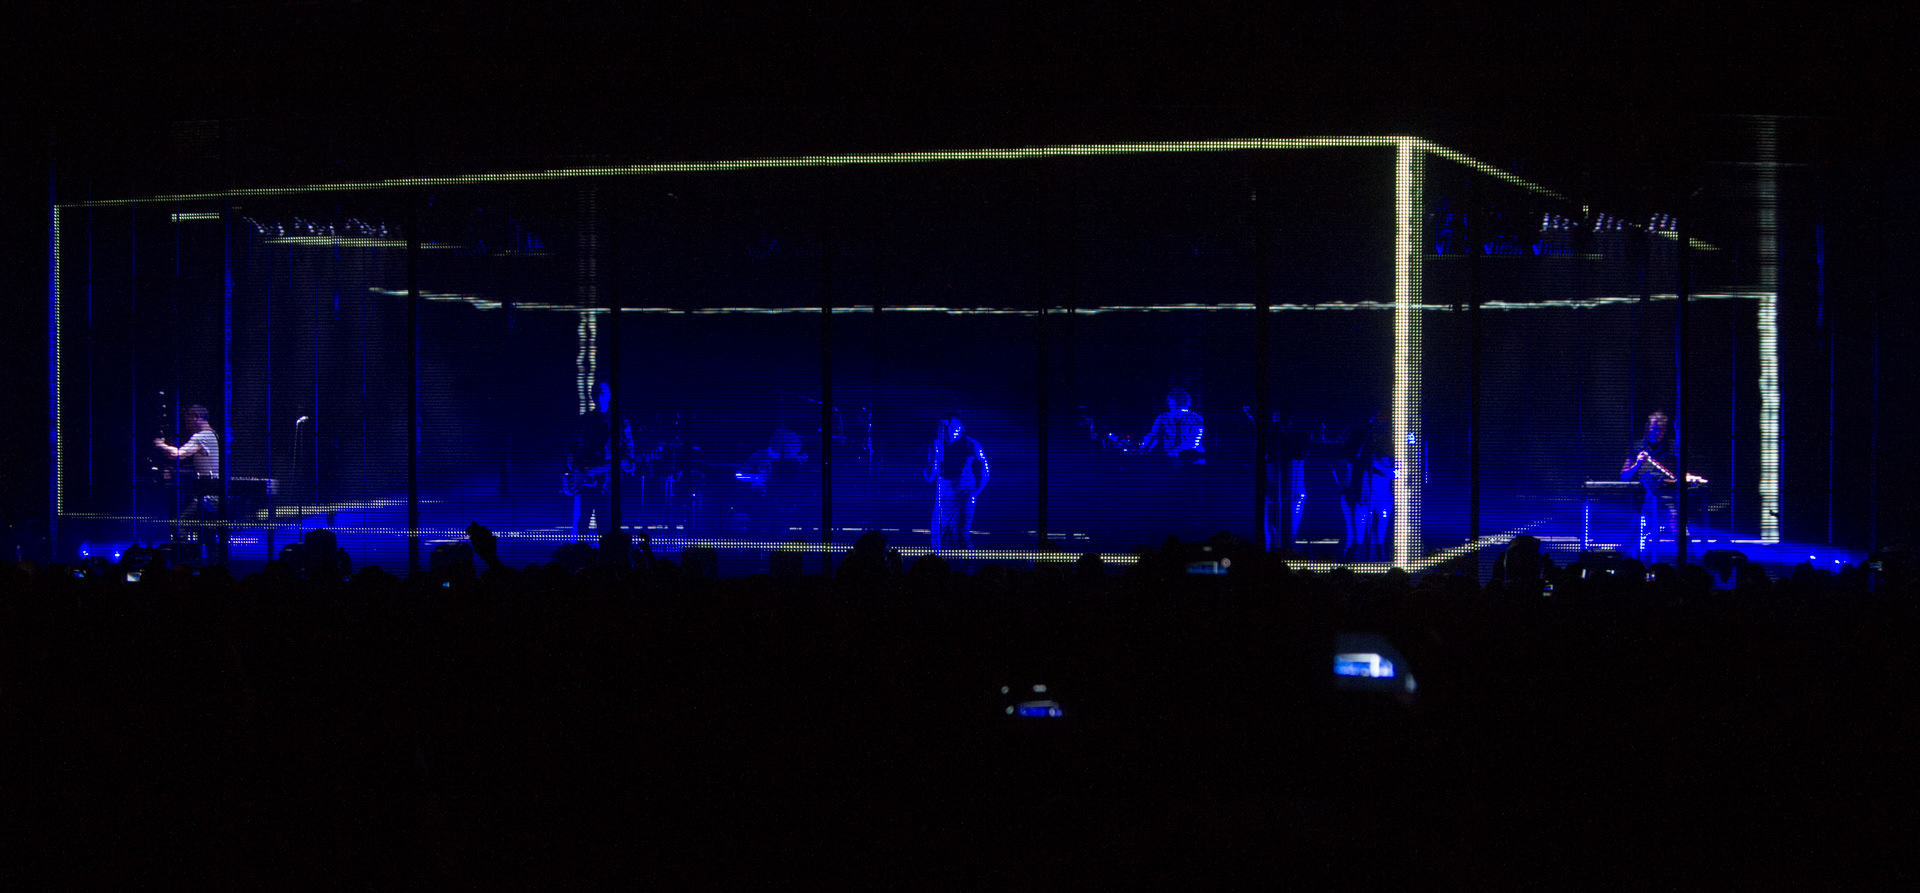 Perfect Nine Inch Nails Tension Tour Pattern - Nail Art Design Ideas ...